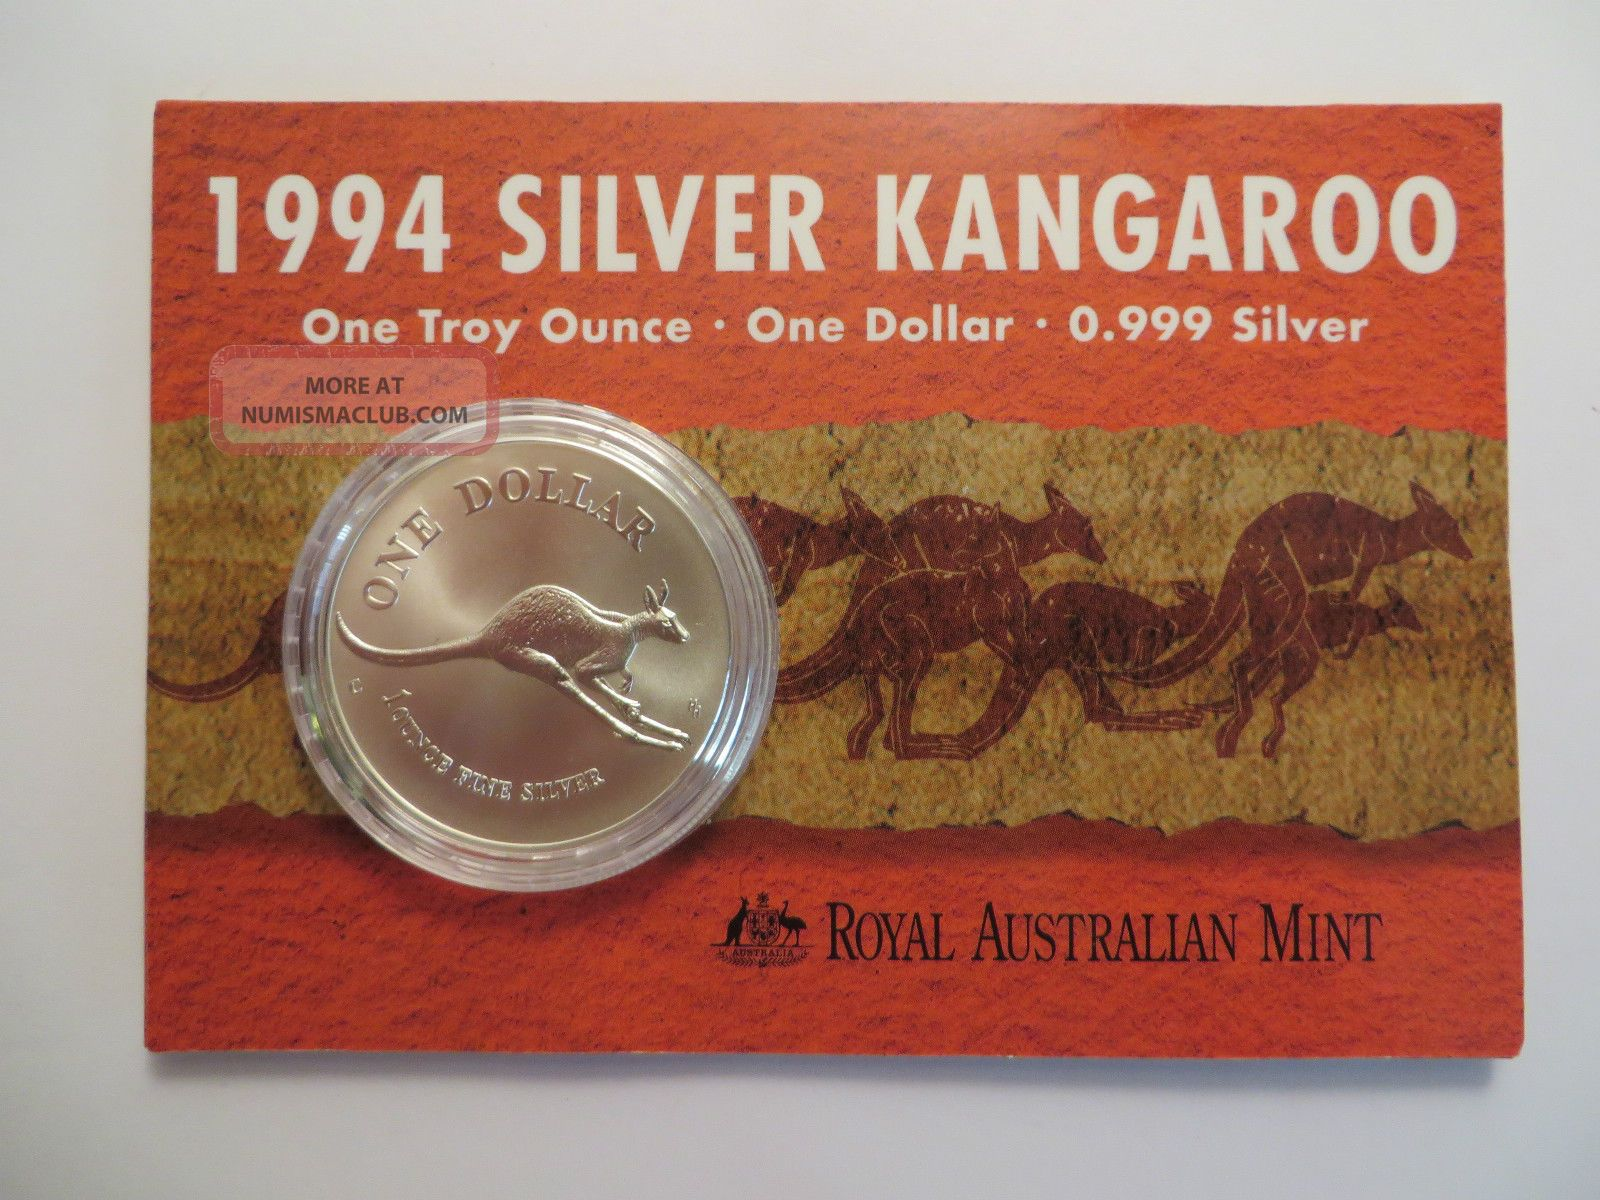 1998 1 Oz Silver Kangaroo,  Royal Australian,  Uncirculated Silver photo